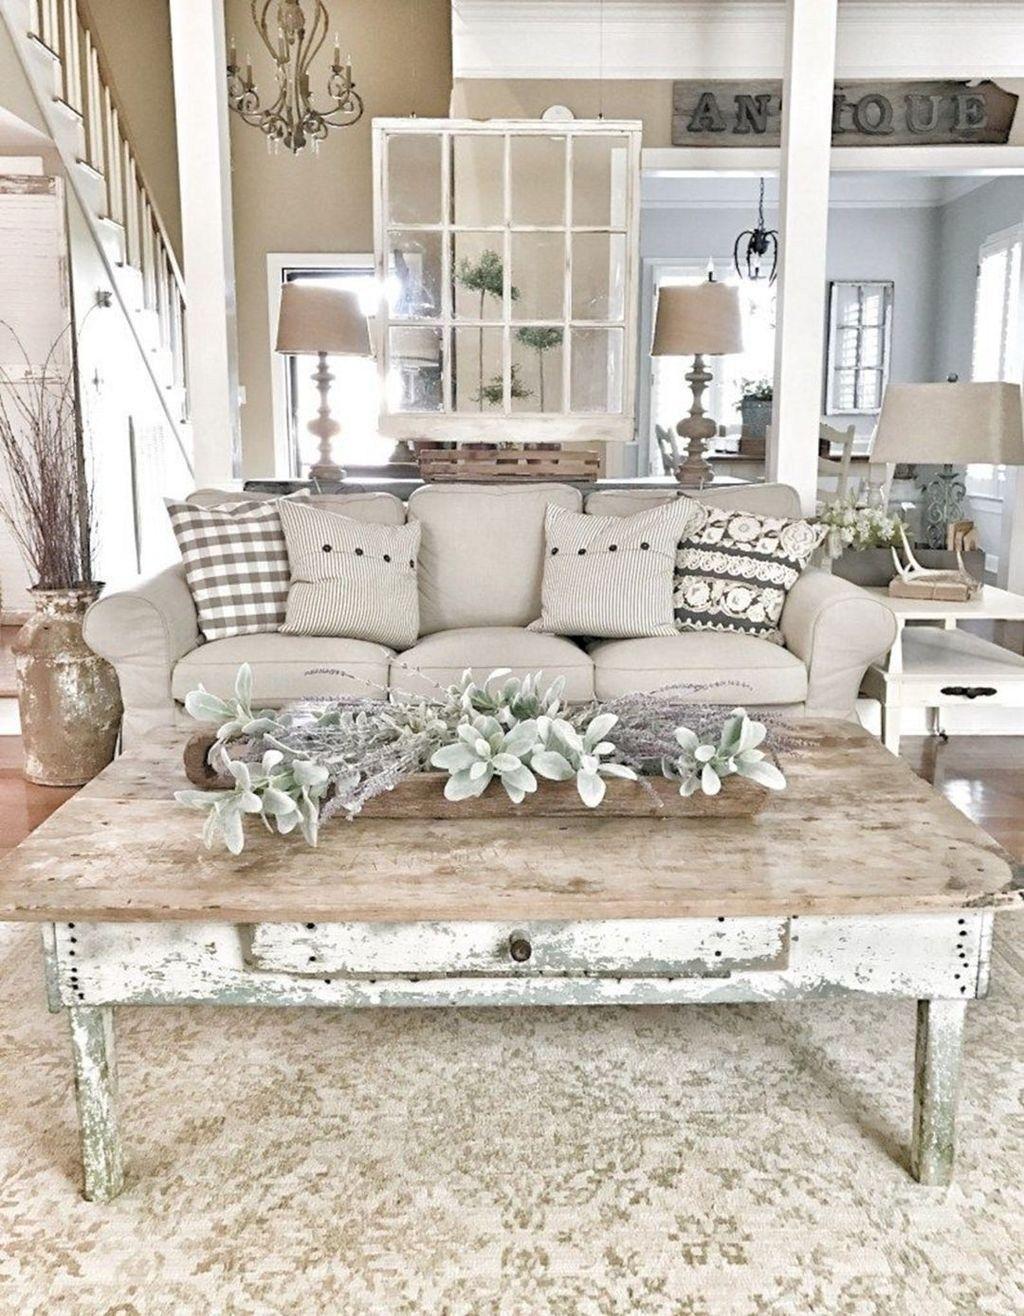 cozy farmhouse living room decor ideas 11 modern on modern farmhouse living room design and decor inspirations country farmhouse furniture id=37770